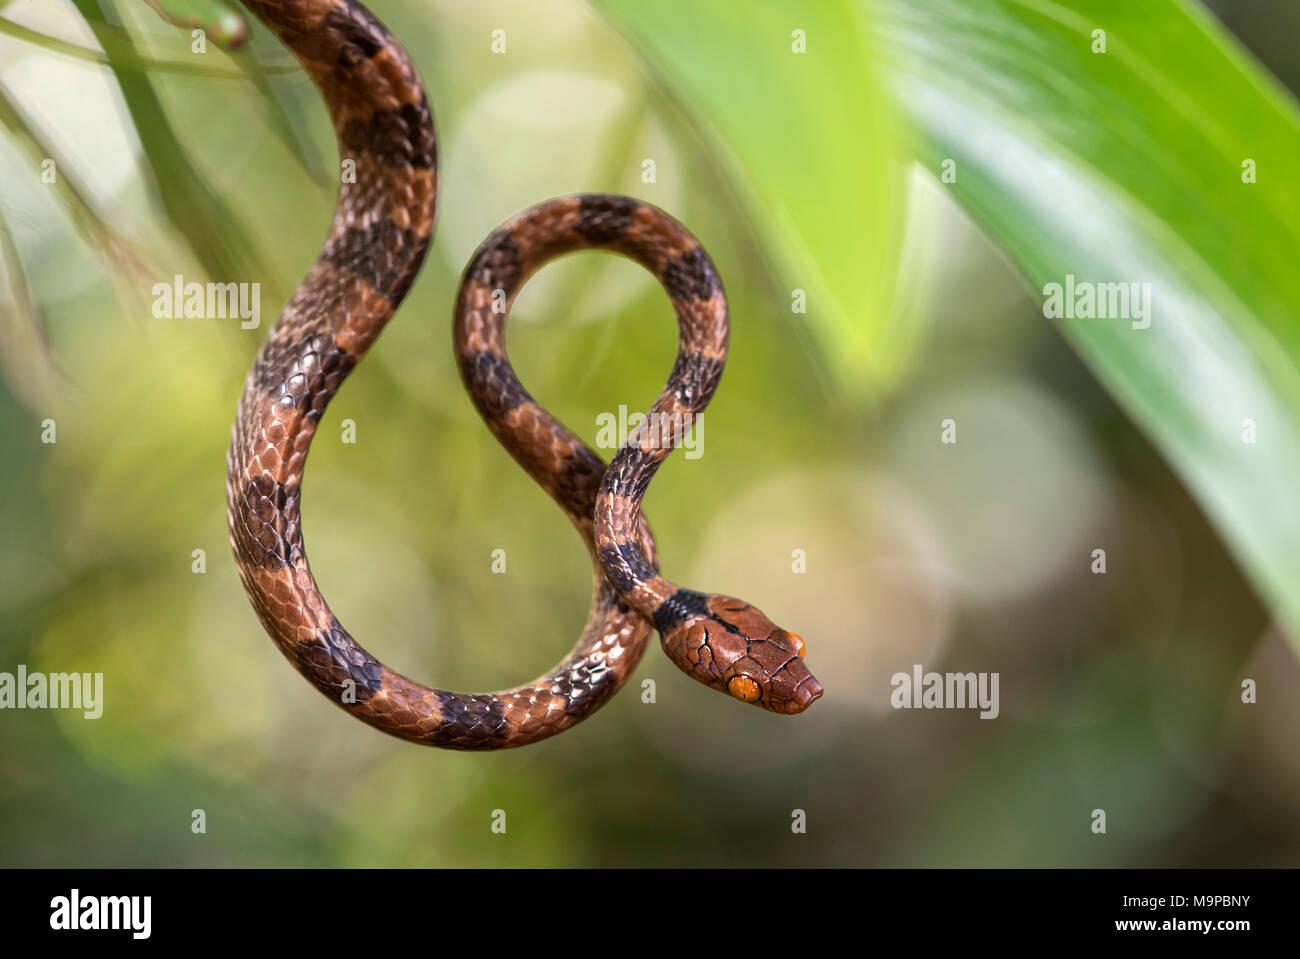 Tree Snake (Stenophis arctifasciatus), Ankanin Ny Nofy, Madagascar - Stock Image